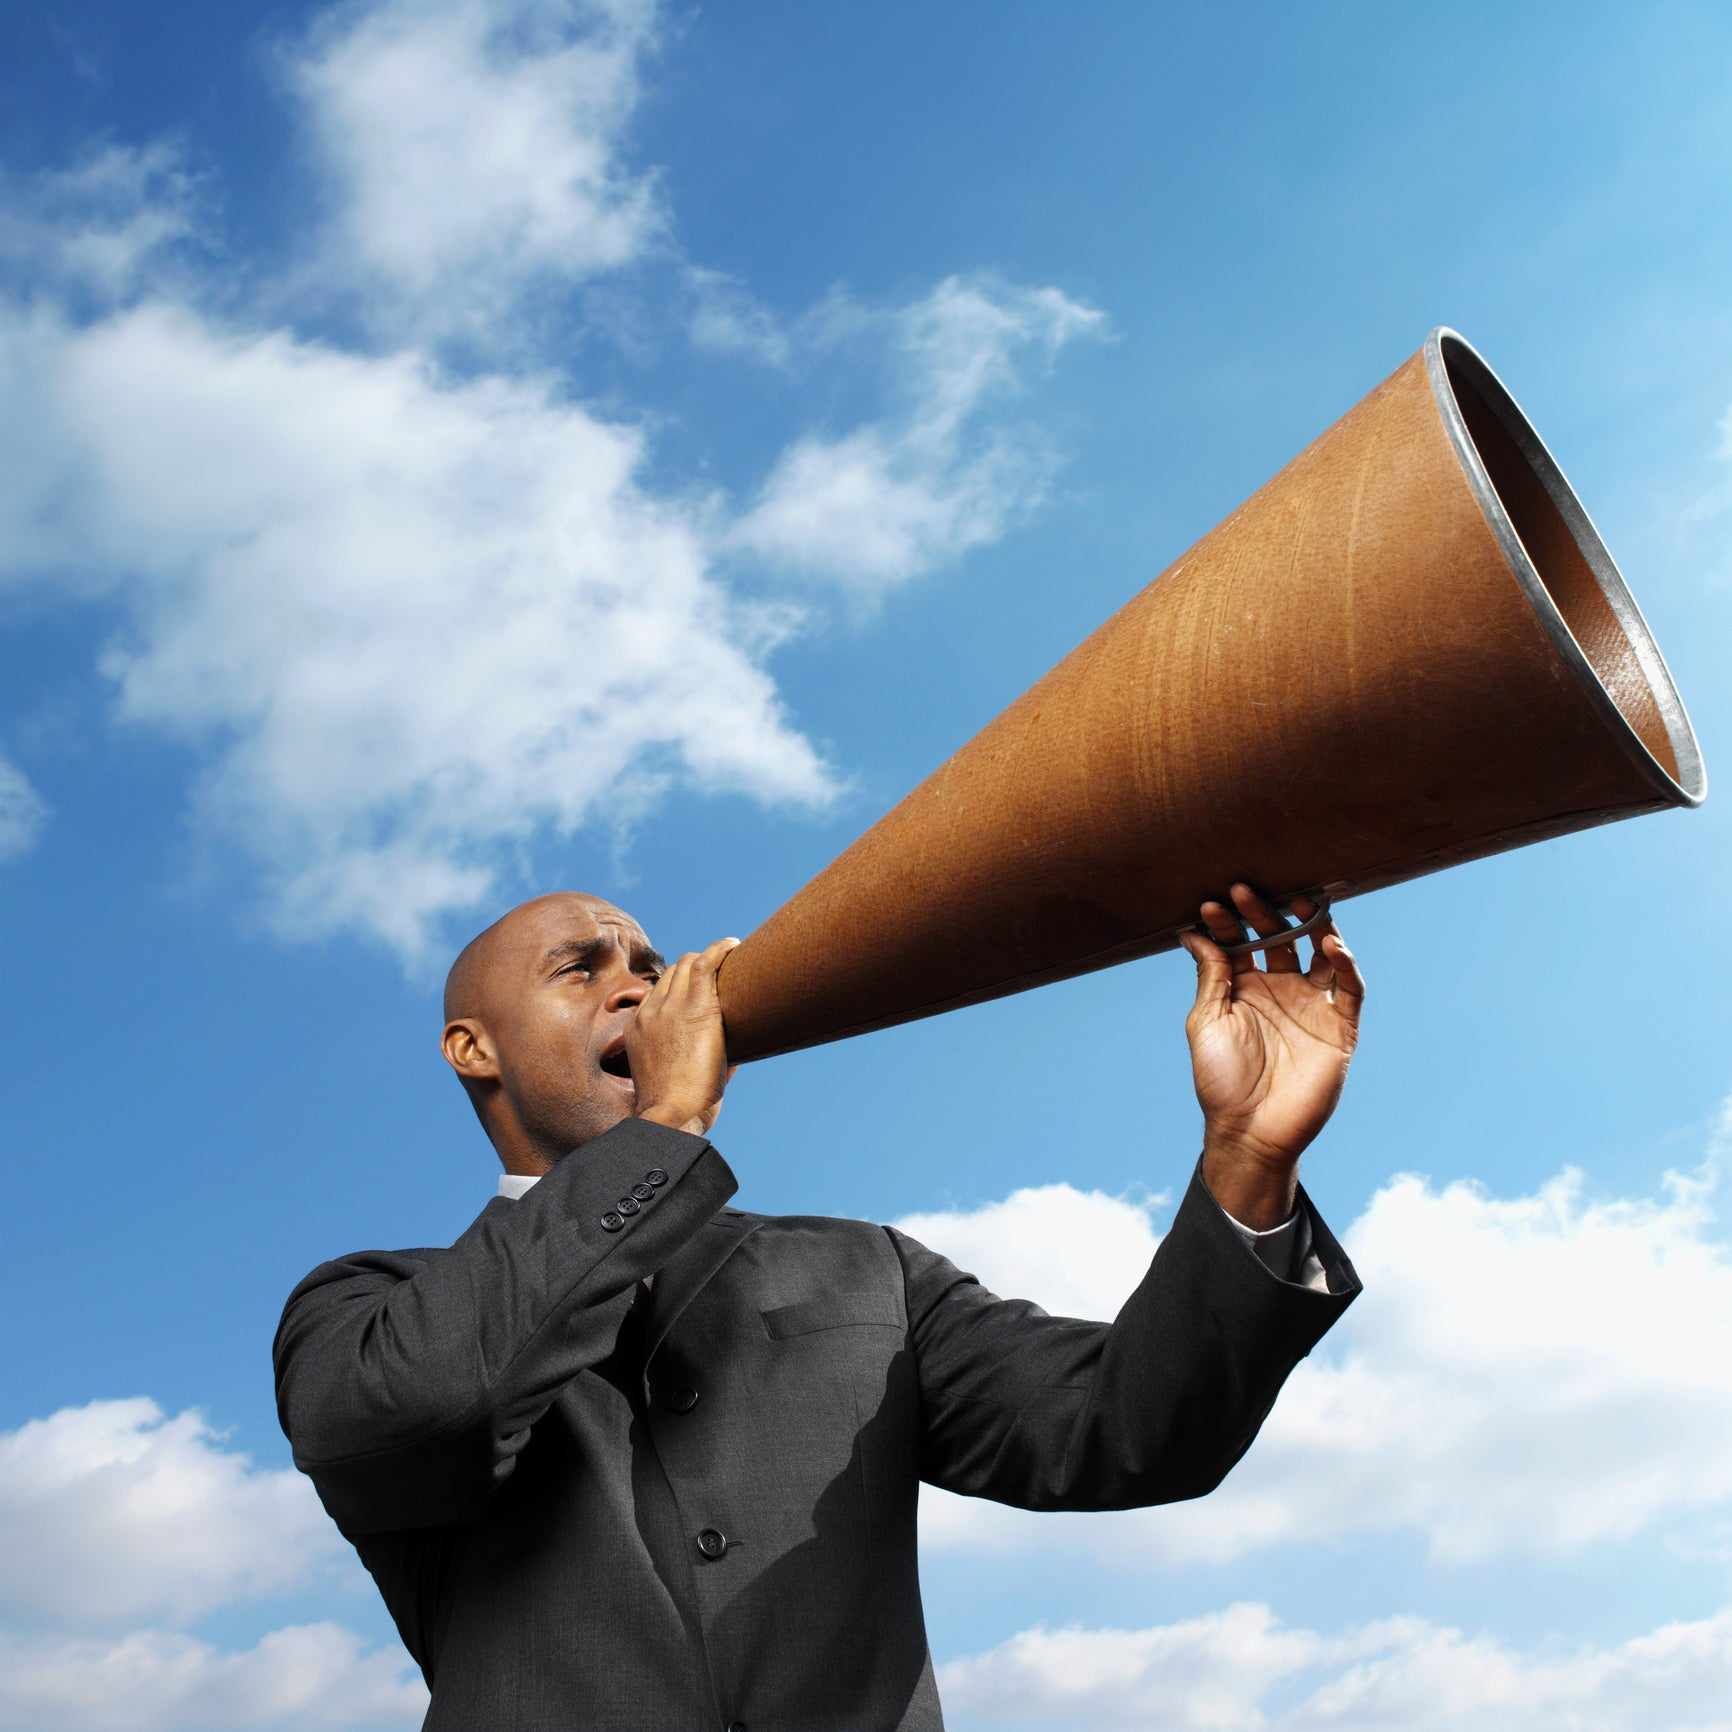 man holding large megaphone against blue cloudy sky